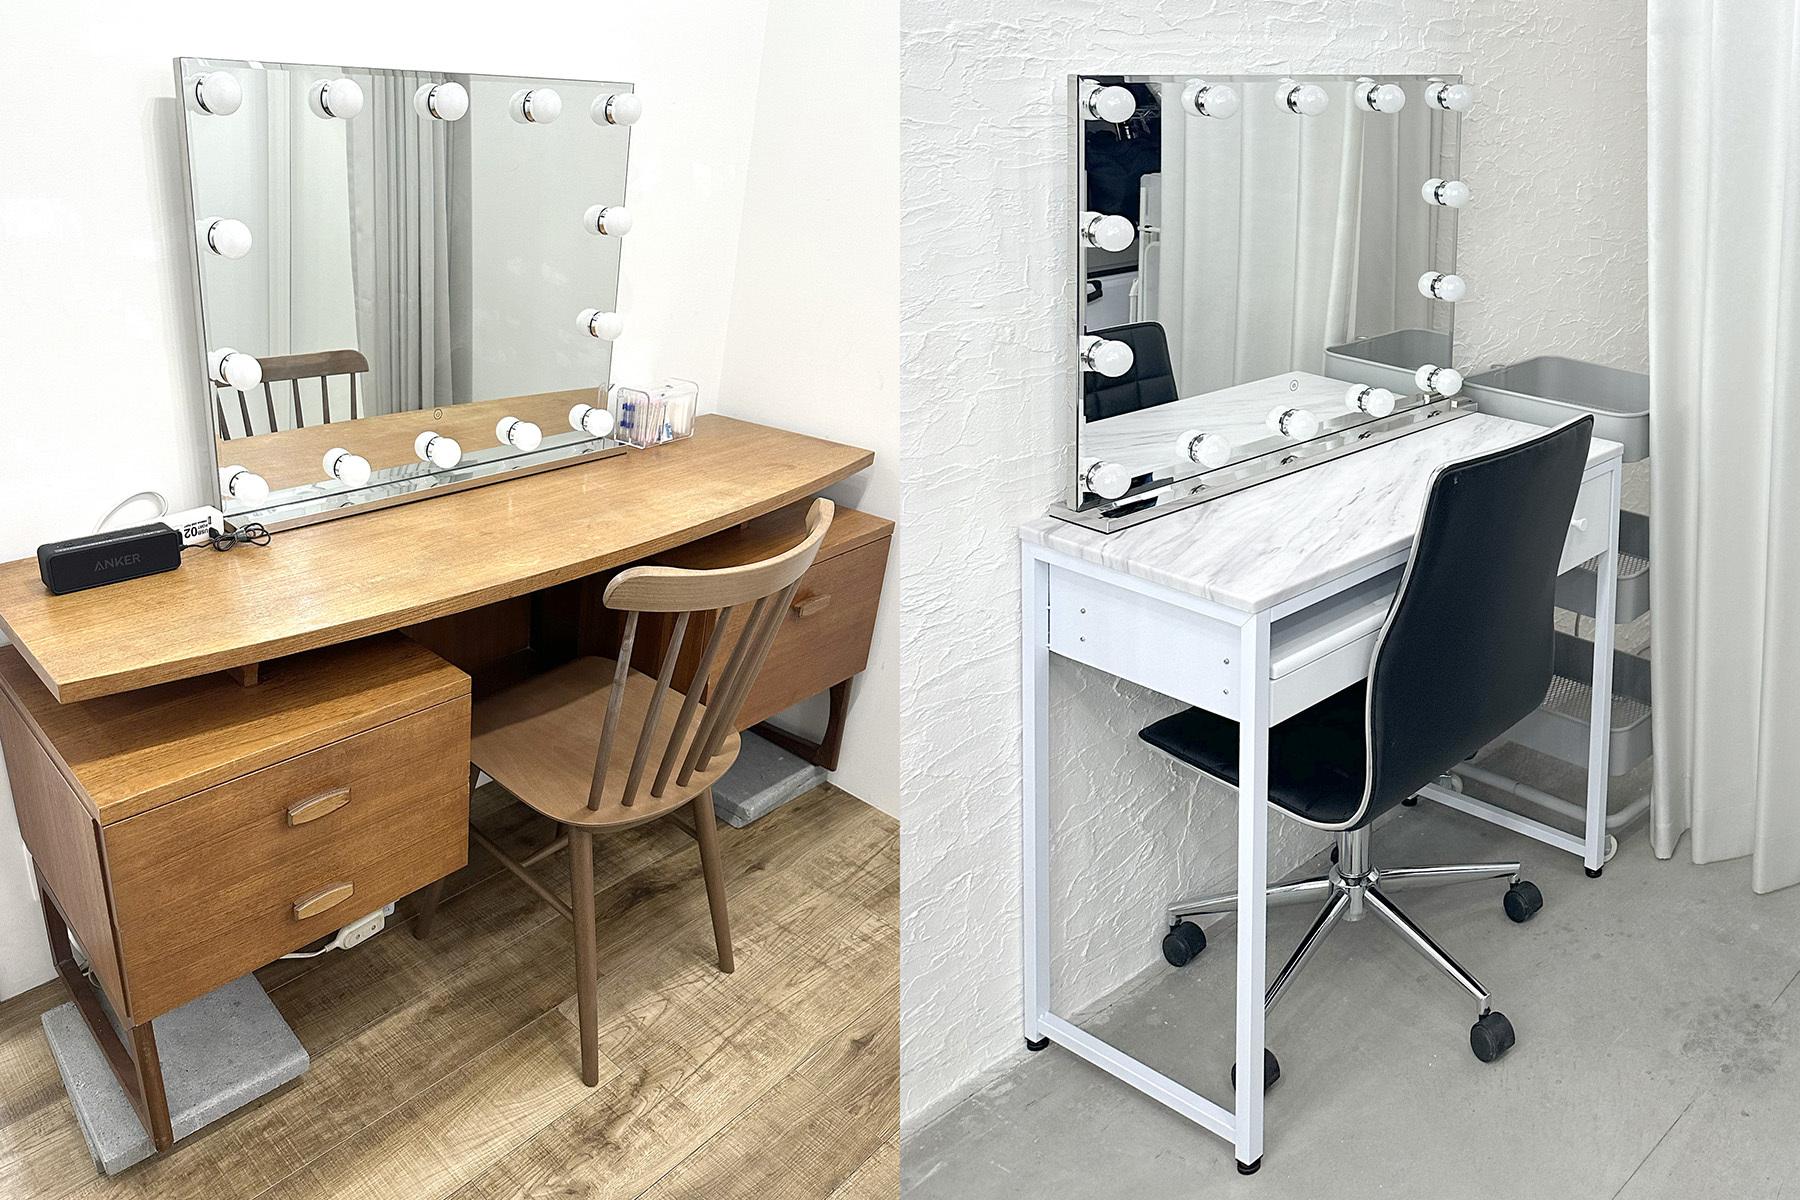 STUDIO FLYINGCAT (スタジオ フライングキャット)充実の椅子/鏡/ハンガーラック